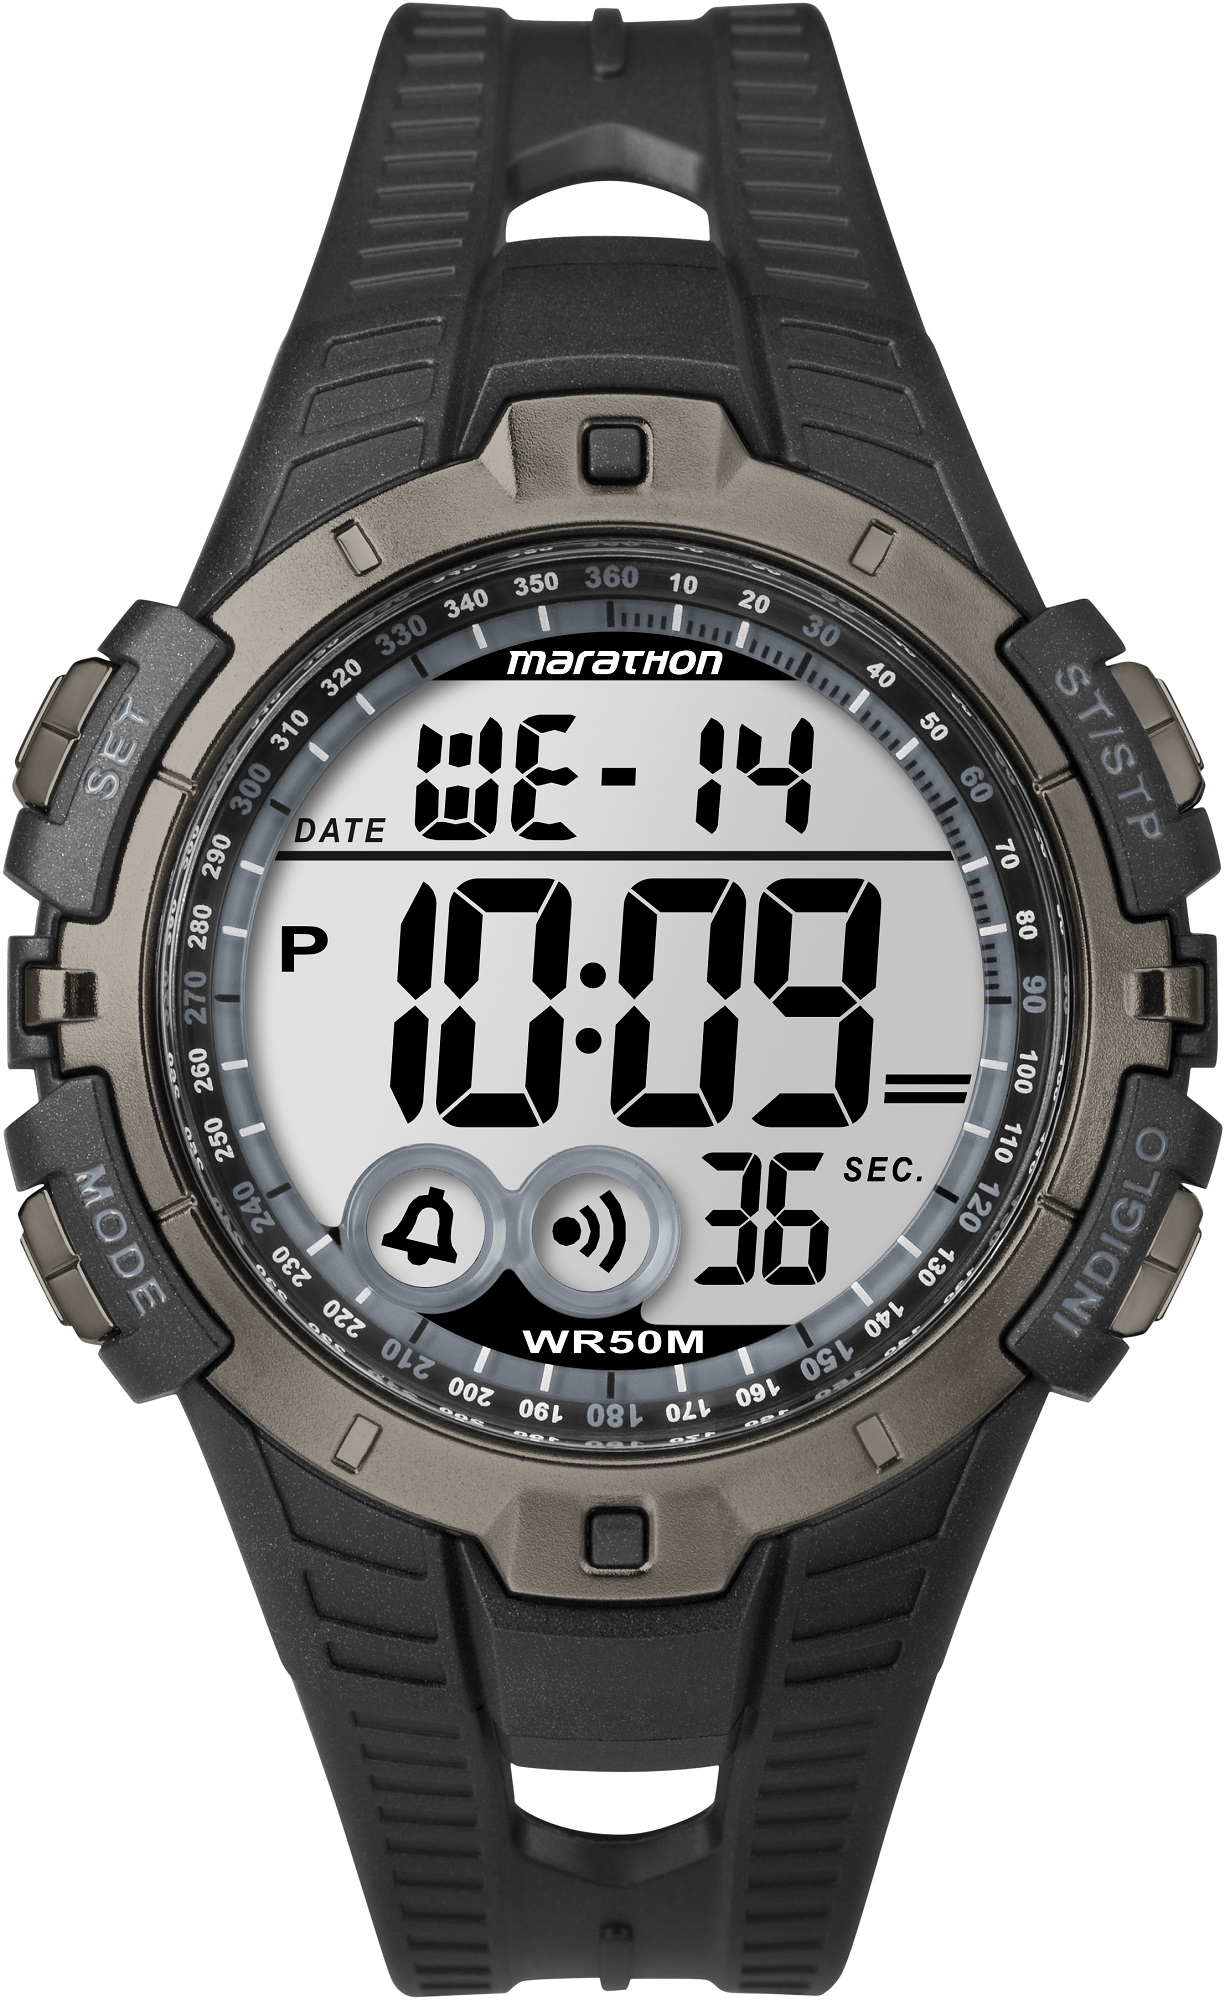 Наручные часы мужские Timex Marathon, цвет: черный. T5K802 наручные часы timex marathon цвет черный t5k803